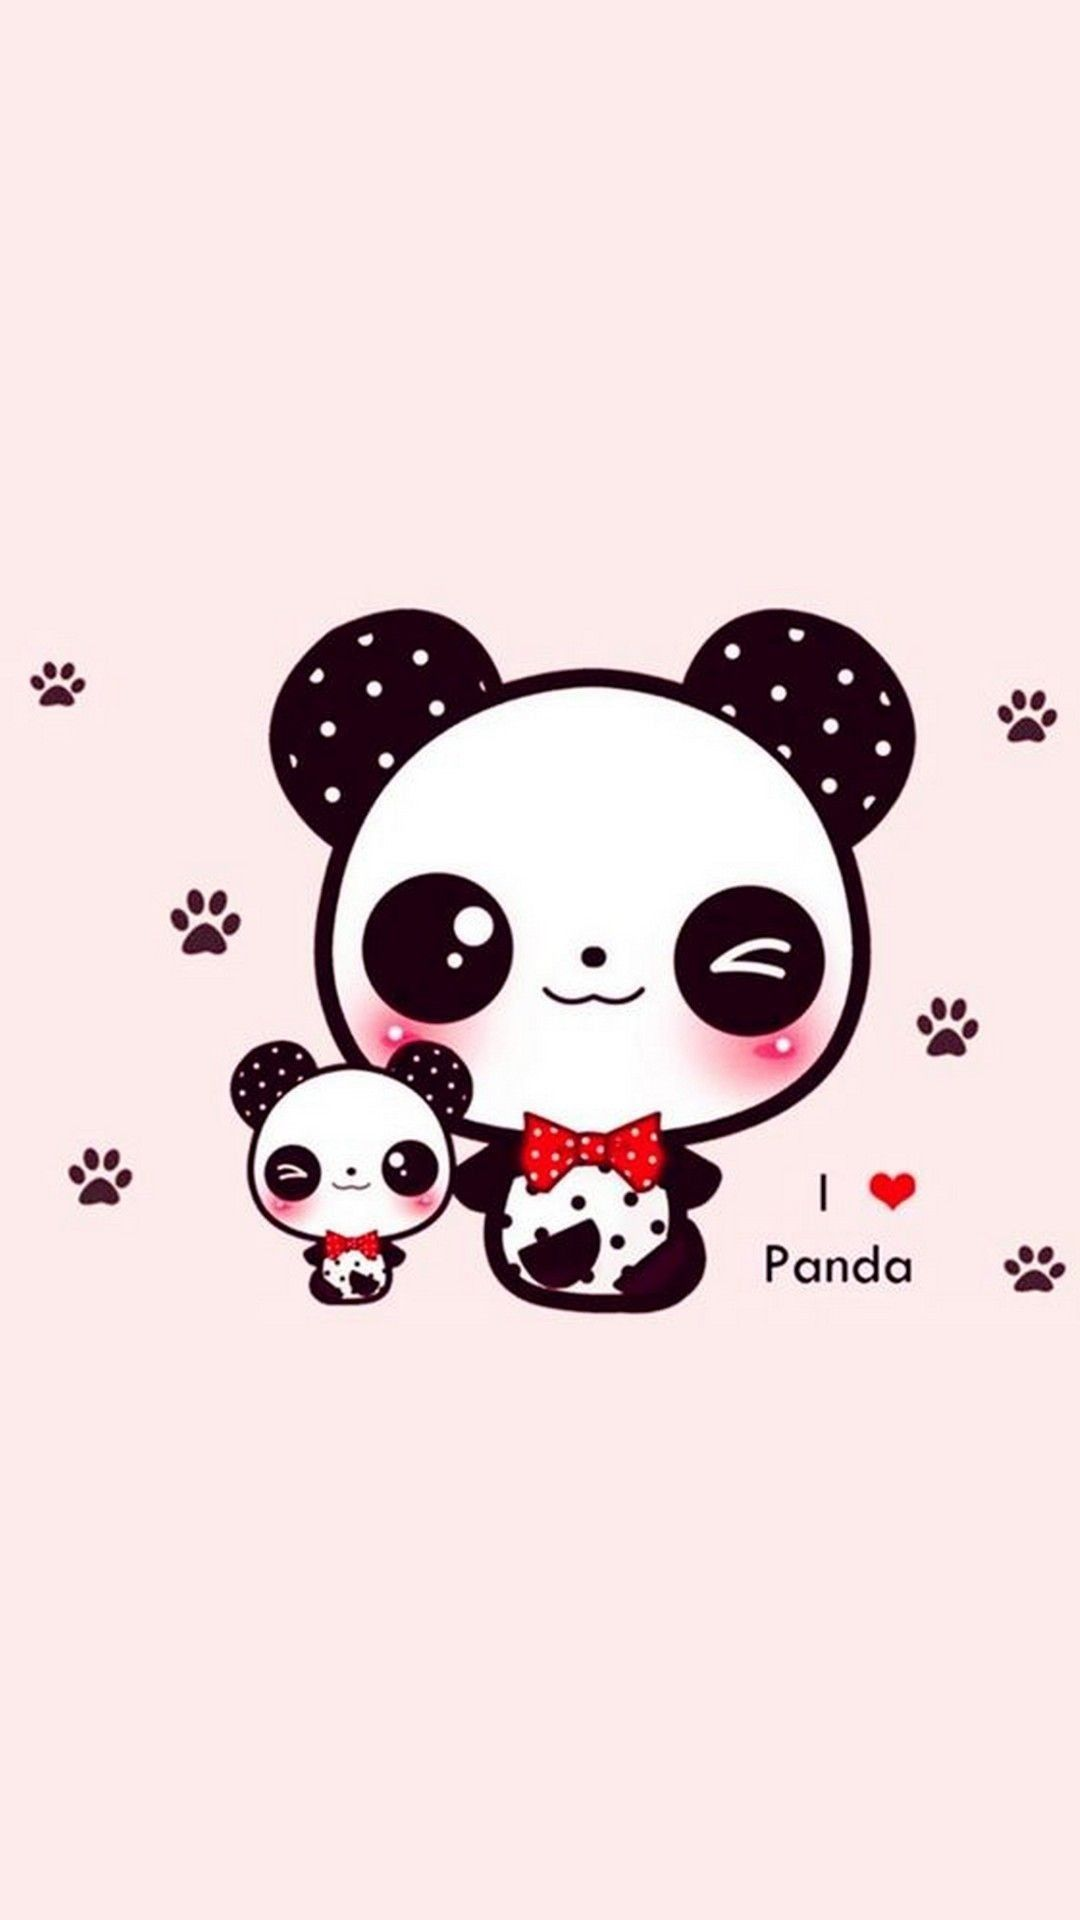 Awesome Be A Panda Wallpapers New Cute Panda Wallpaper For Iphone 2018 Of Elegant White Panda Desk Cute Panda Wallpaper Panda Wallpaper Iphone Panda Wallpapers